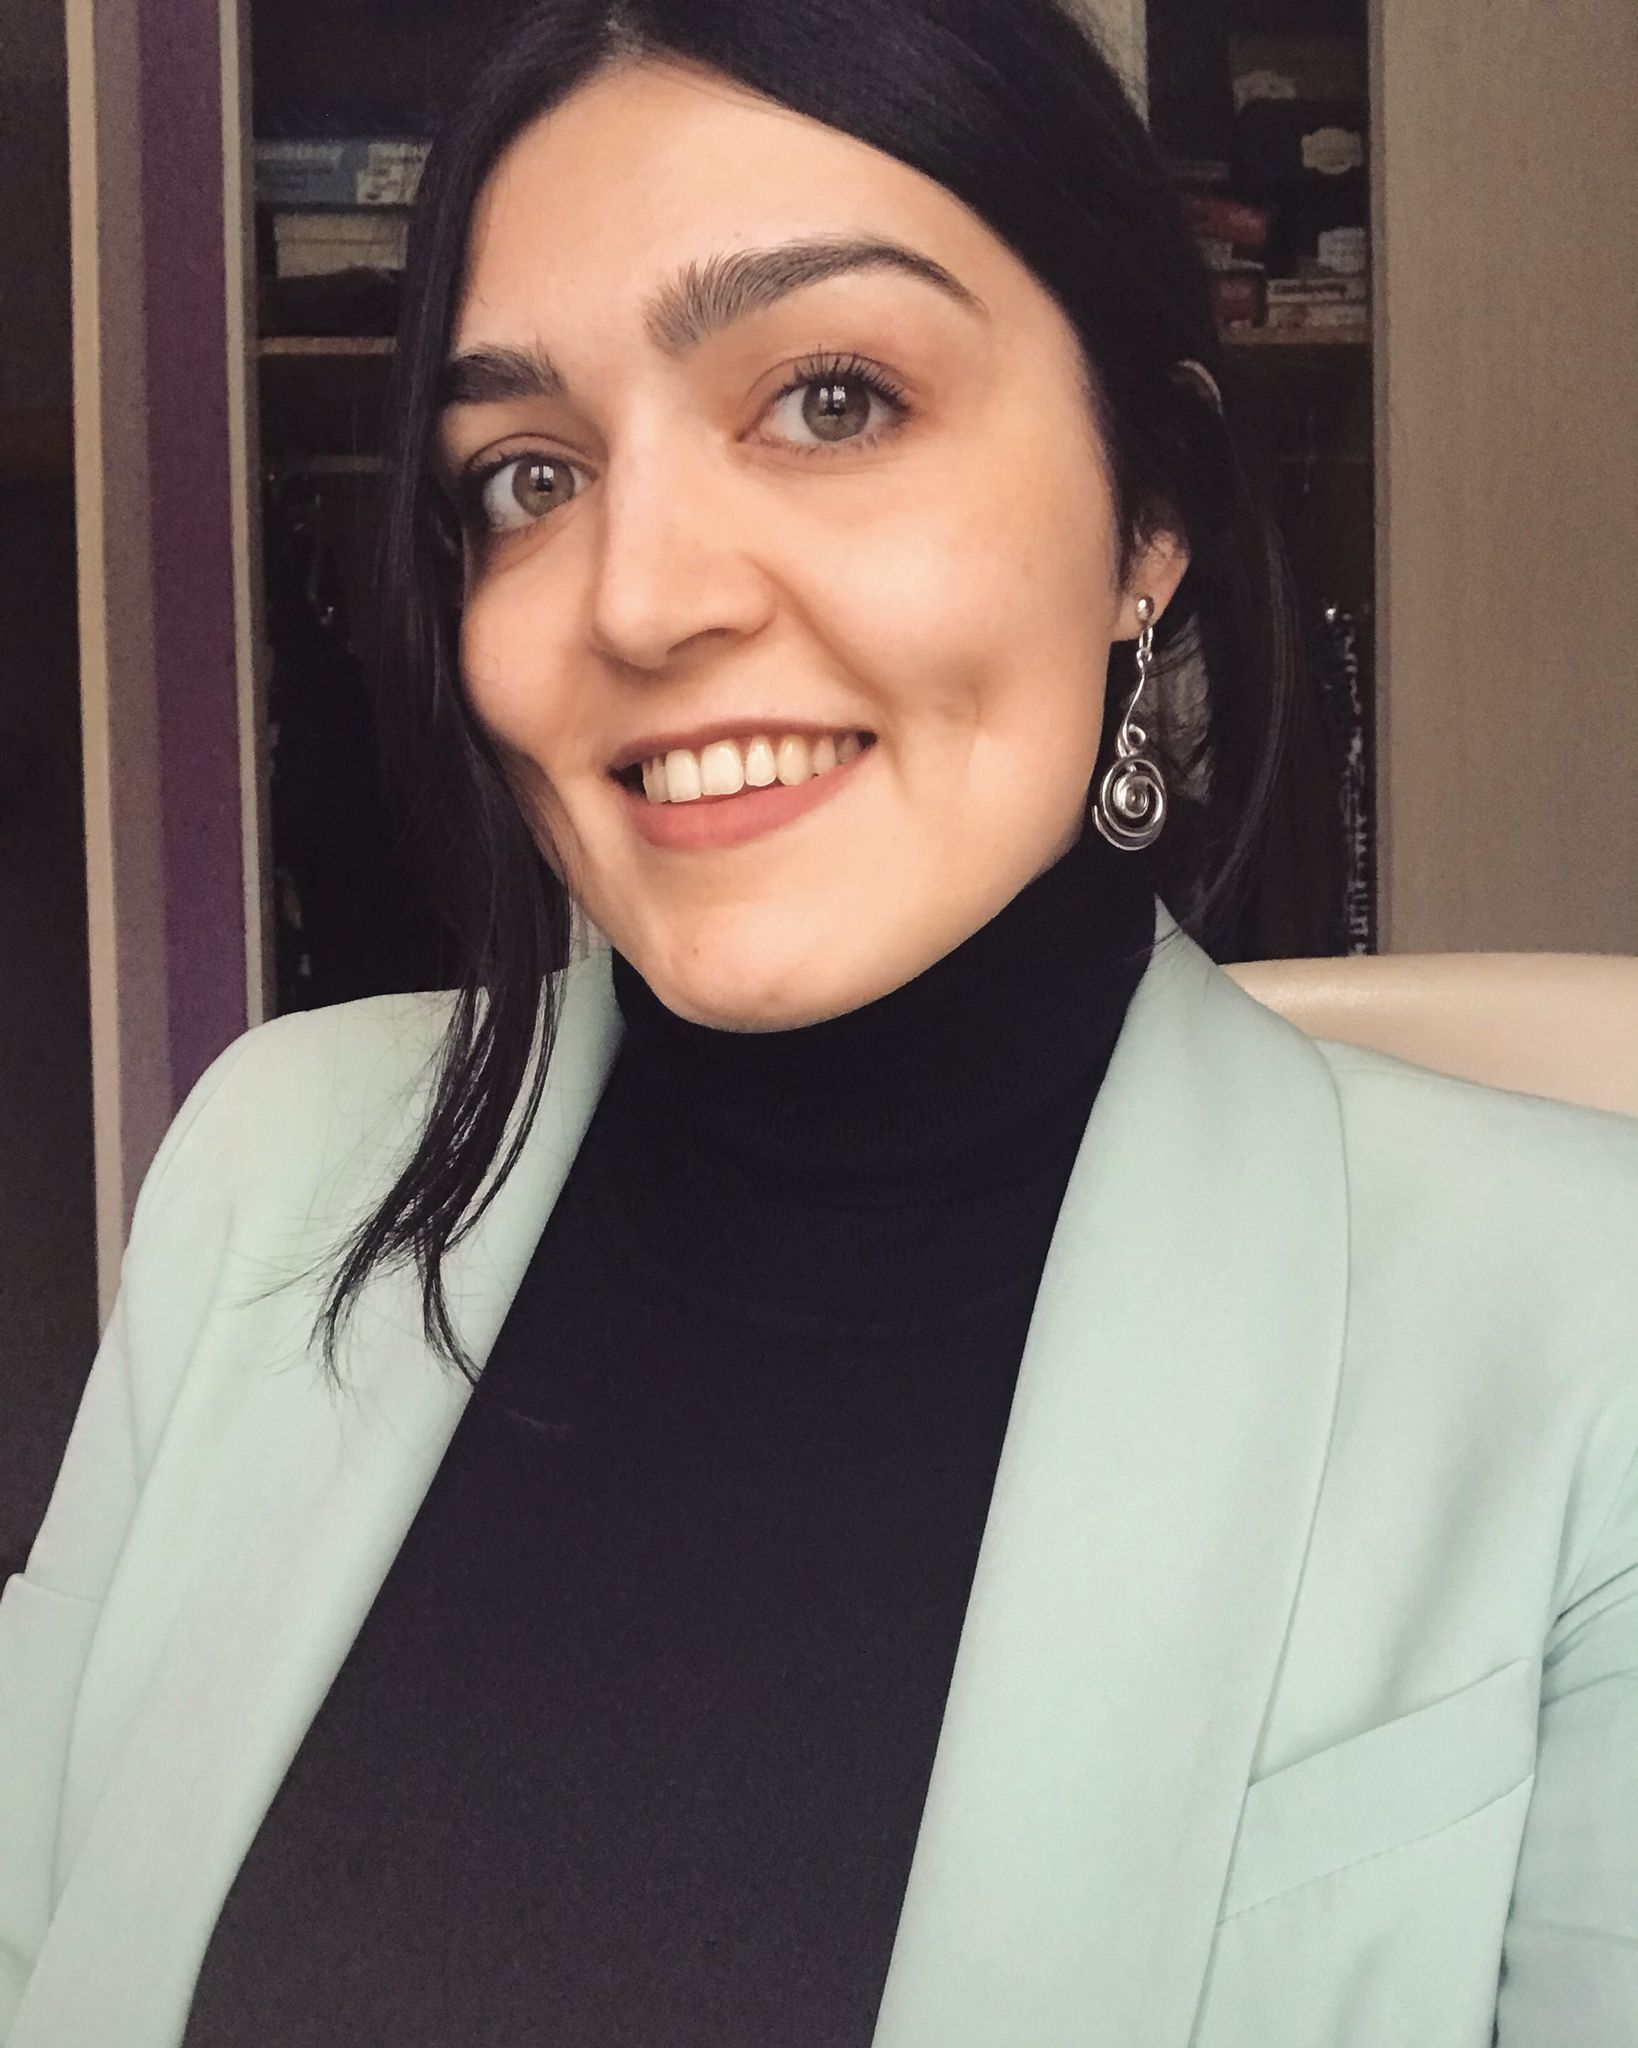 Laura Muñoz Rodríguez